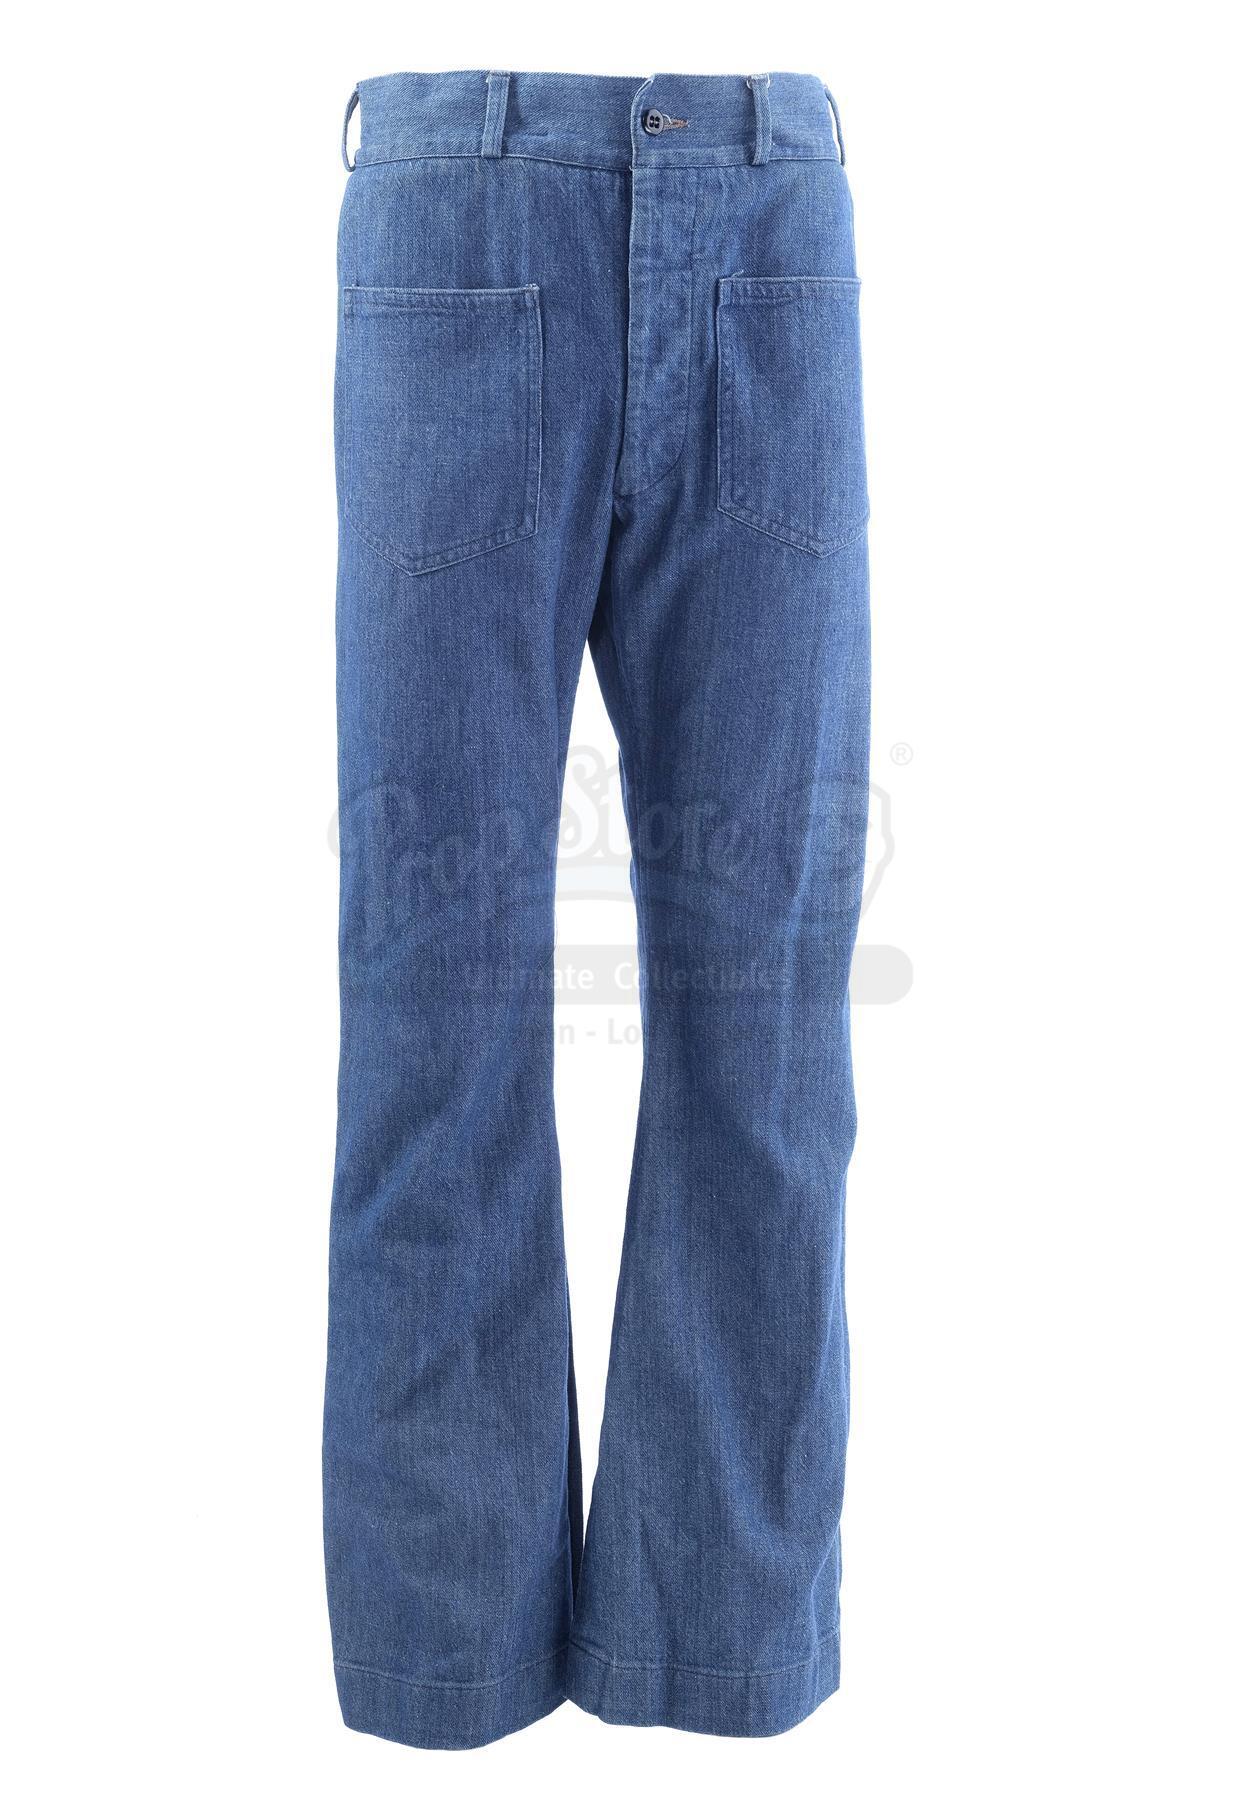 Lot # 1005: THE SAND PEBBLES - Jake Holman's (Steve McQueen) Jeans - Image 2 of 11